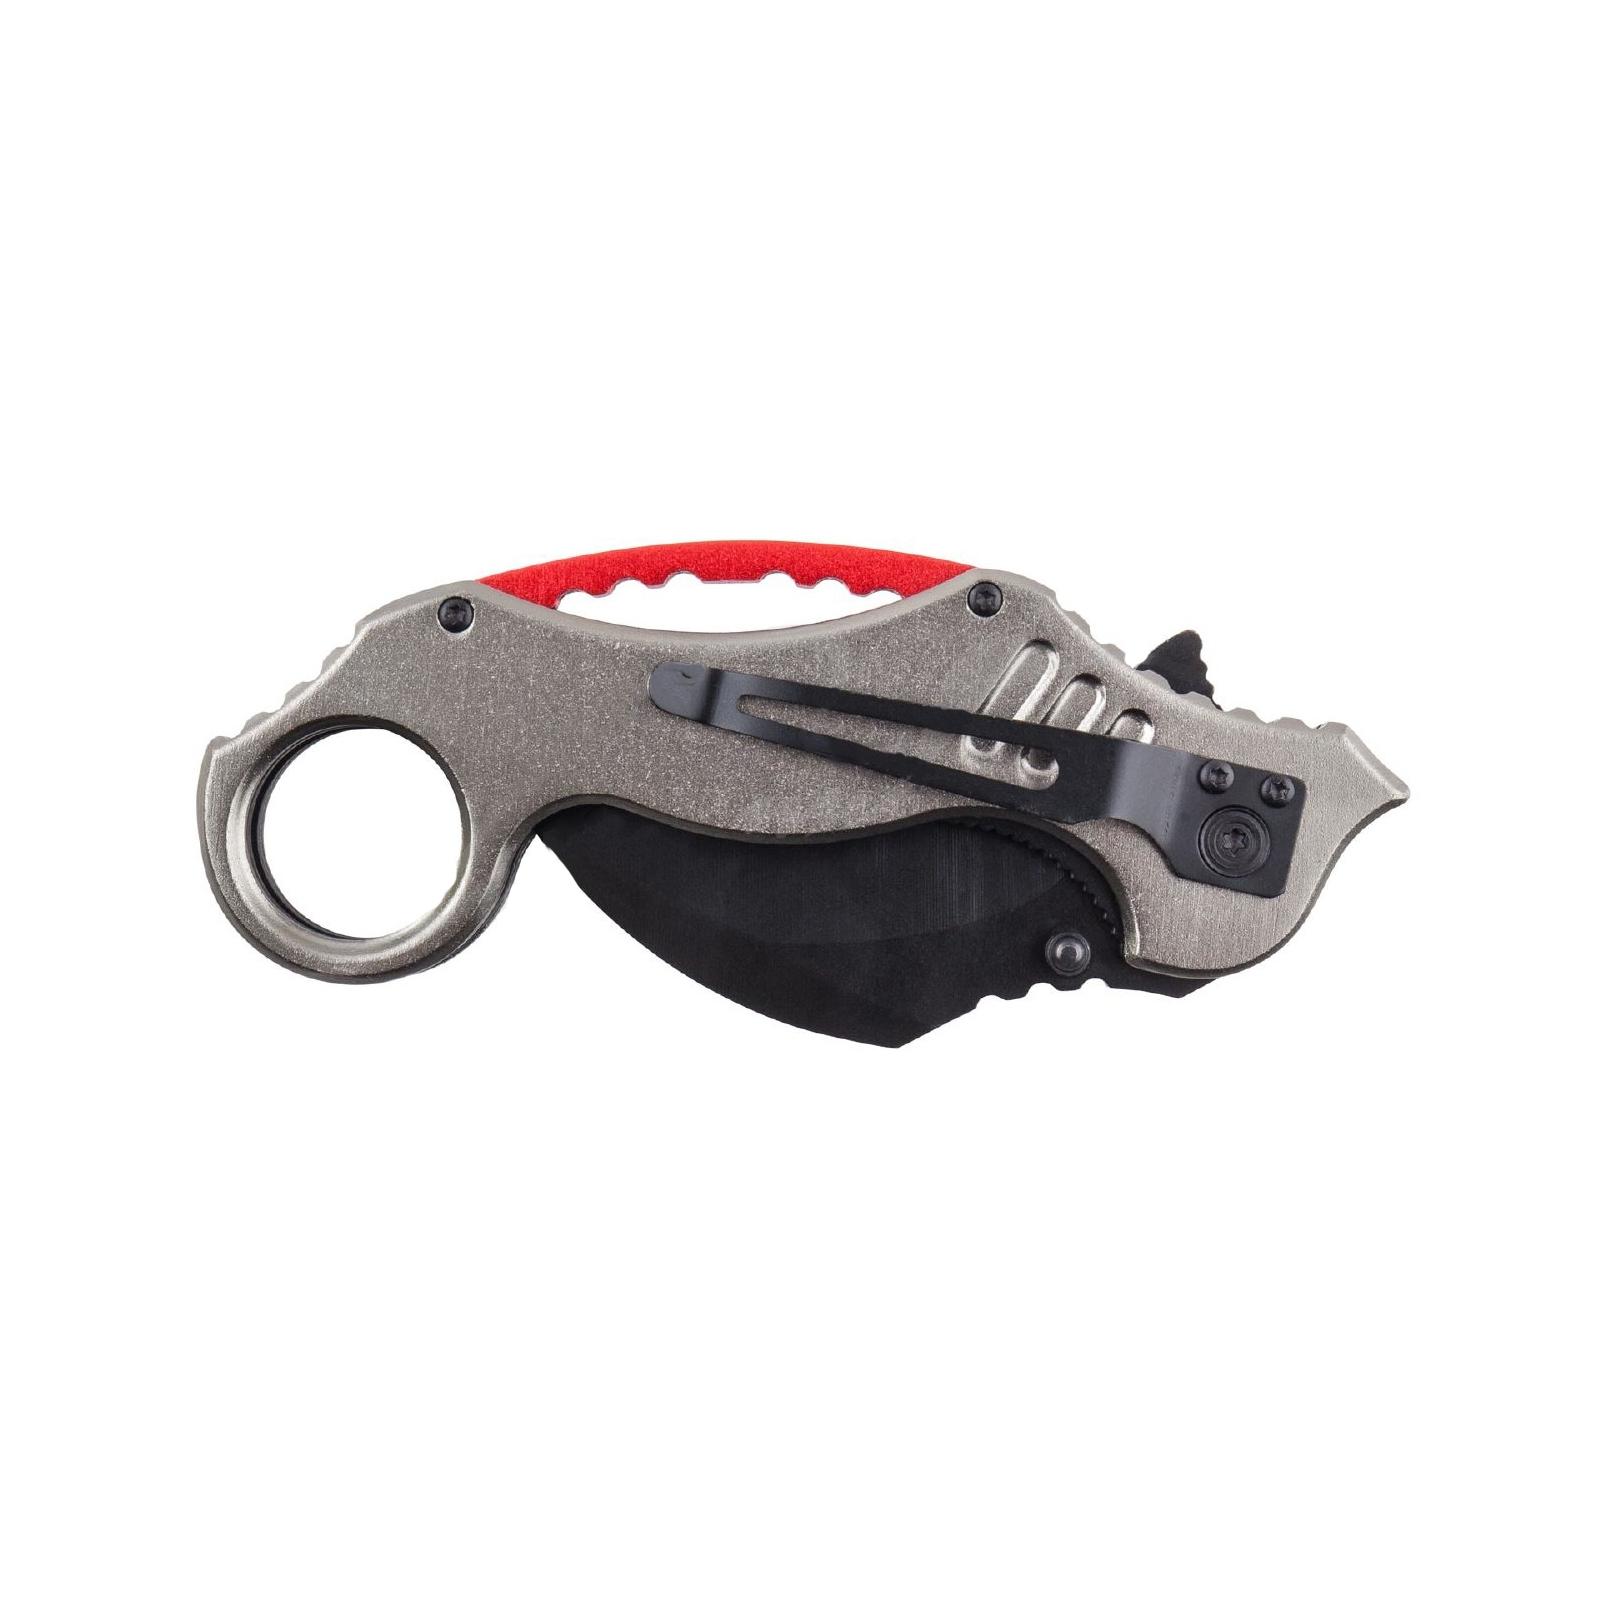 Нож Skif Plus Tiger Claw Gray (H-K2110127Gry) изображение 4